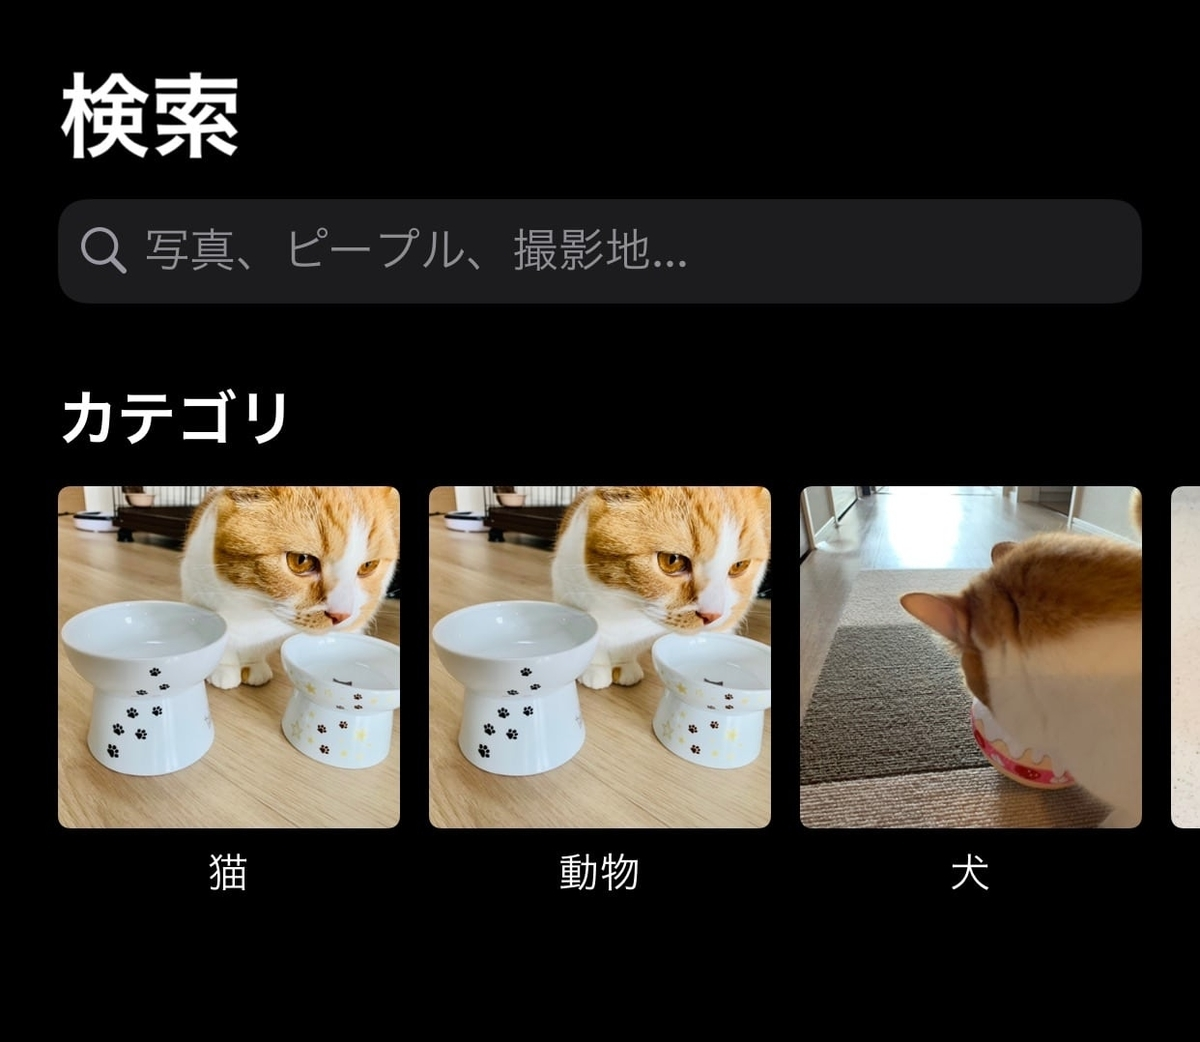 iphoneカメラの検索機能1